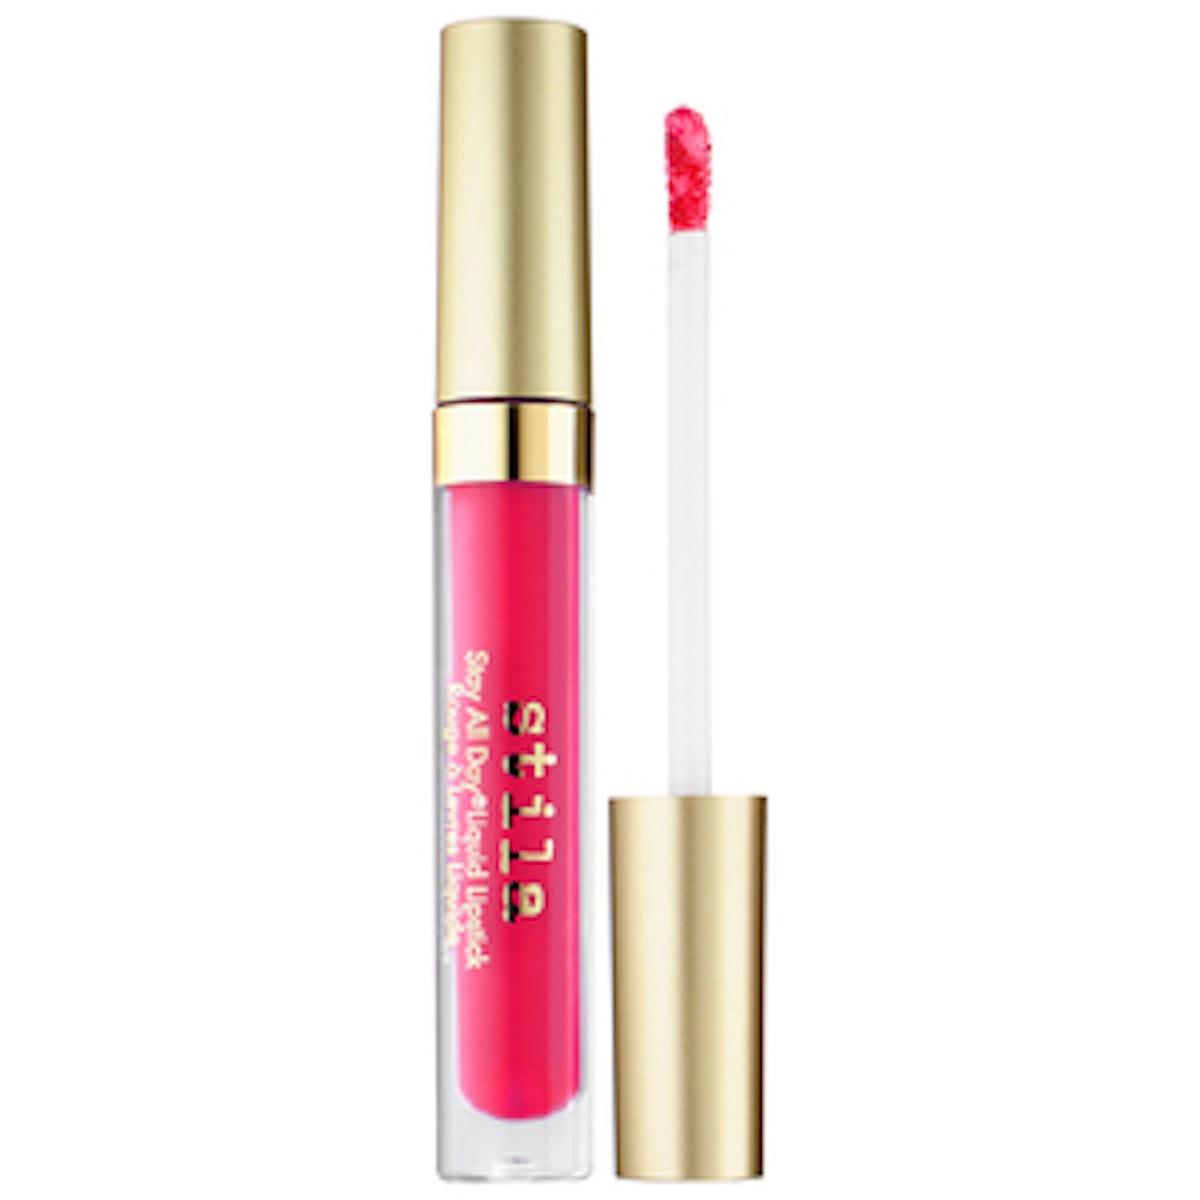 Stay All Day Liquid Lipstick in Amalfi